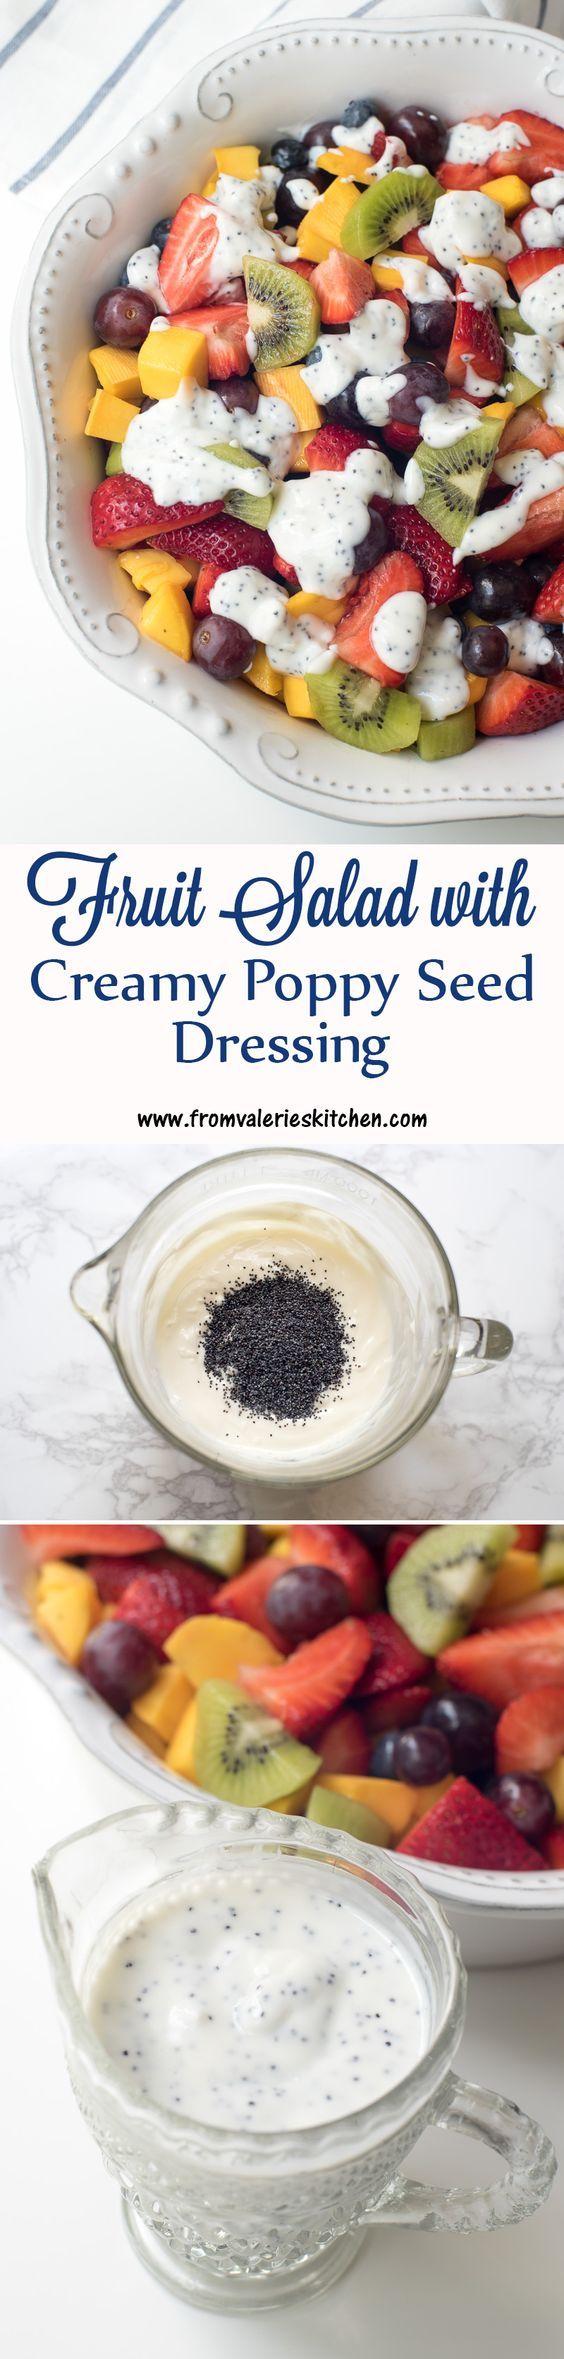 Fruit Salad with Creamy Poppy Seed Dressing ~ http://www.fromvalerieskitchen.com #Freshworks #FreshWorksCrowd [ad]